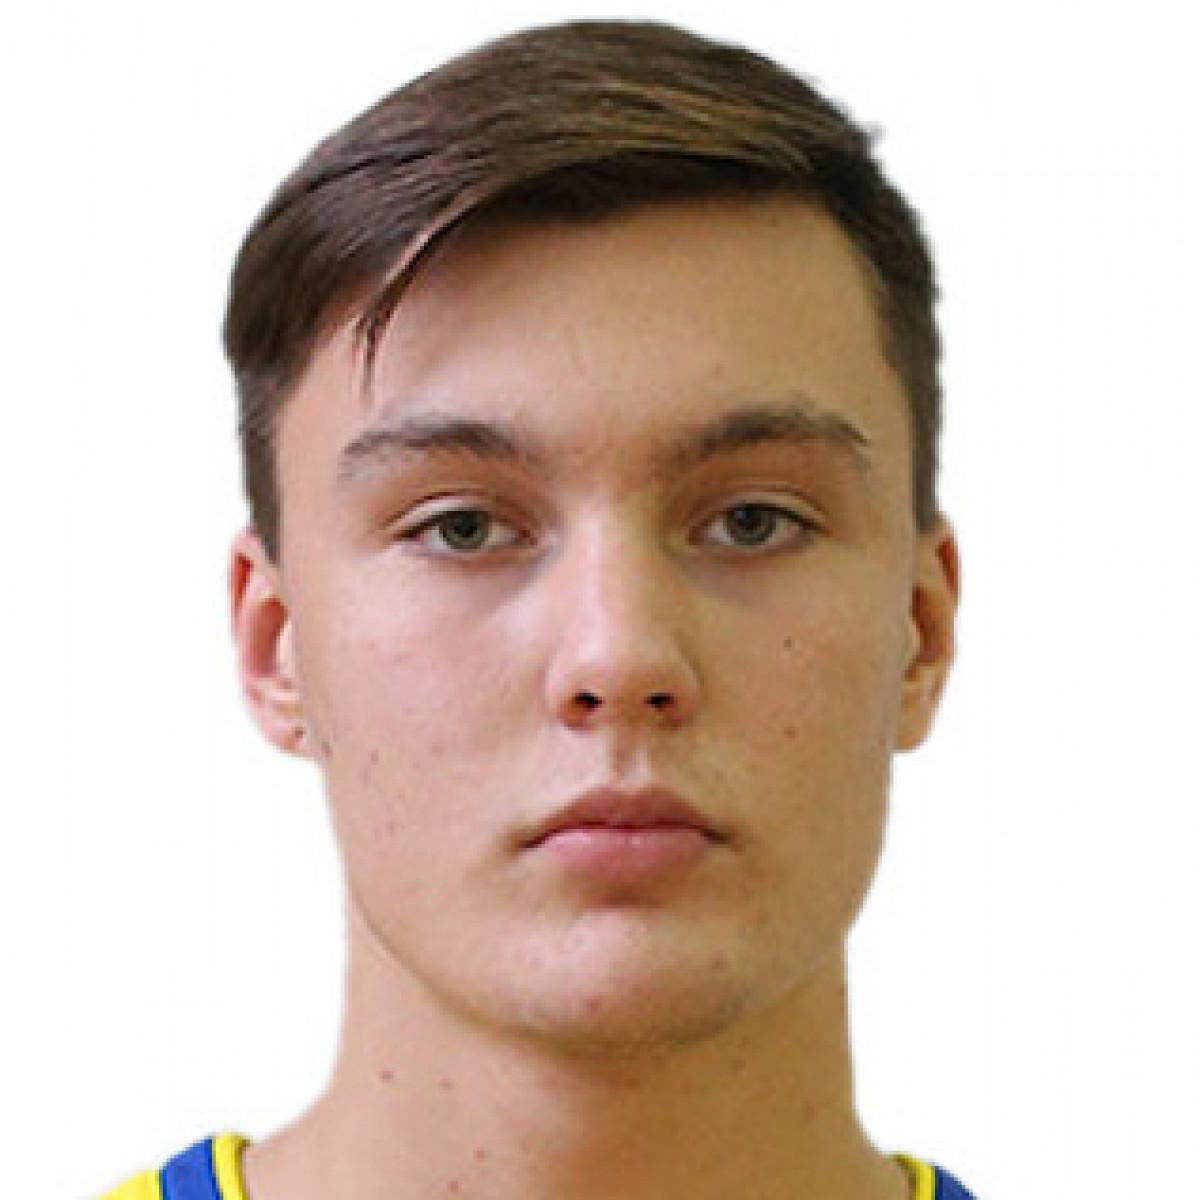 Artem Yakushev